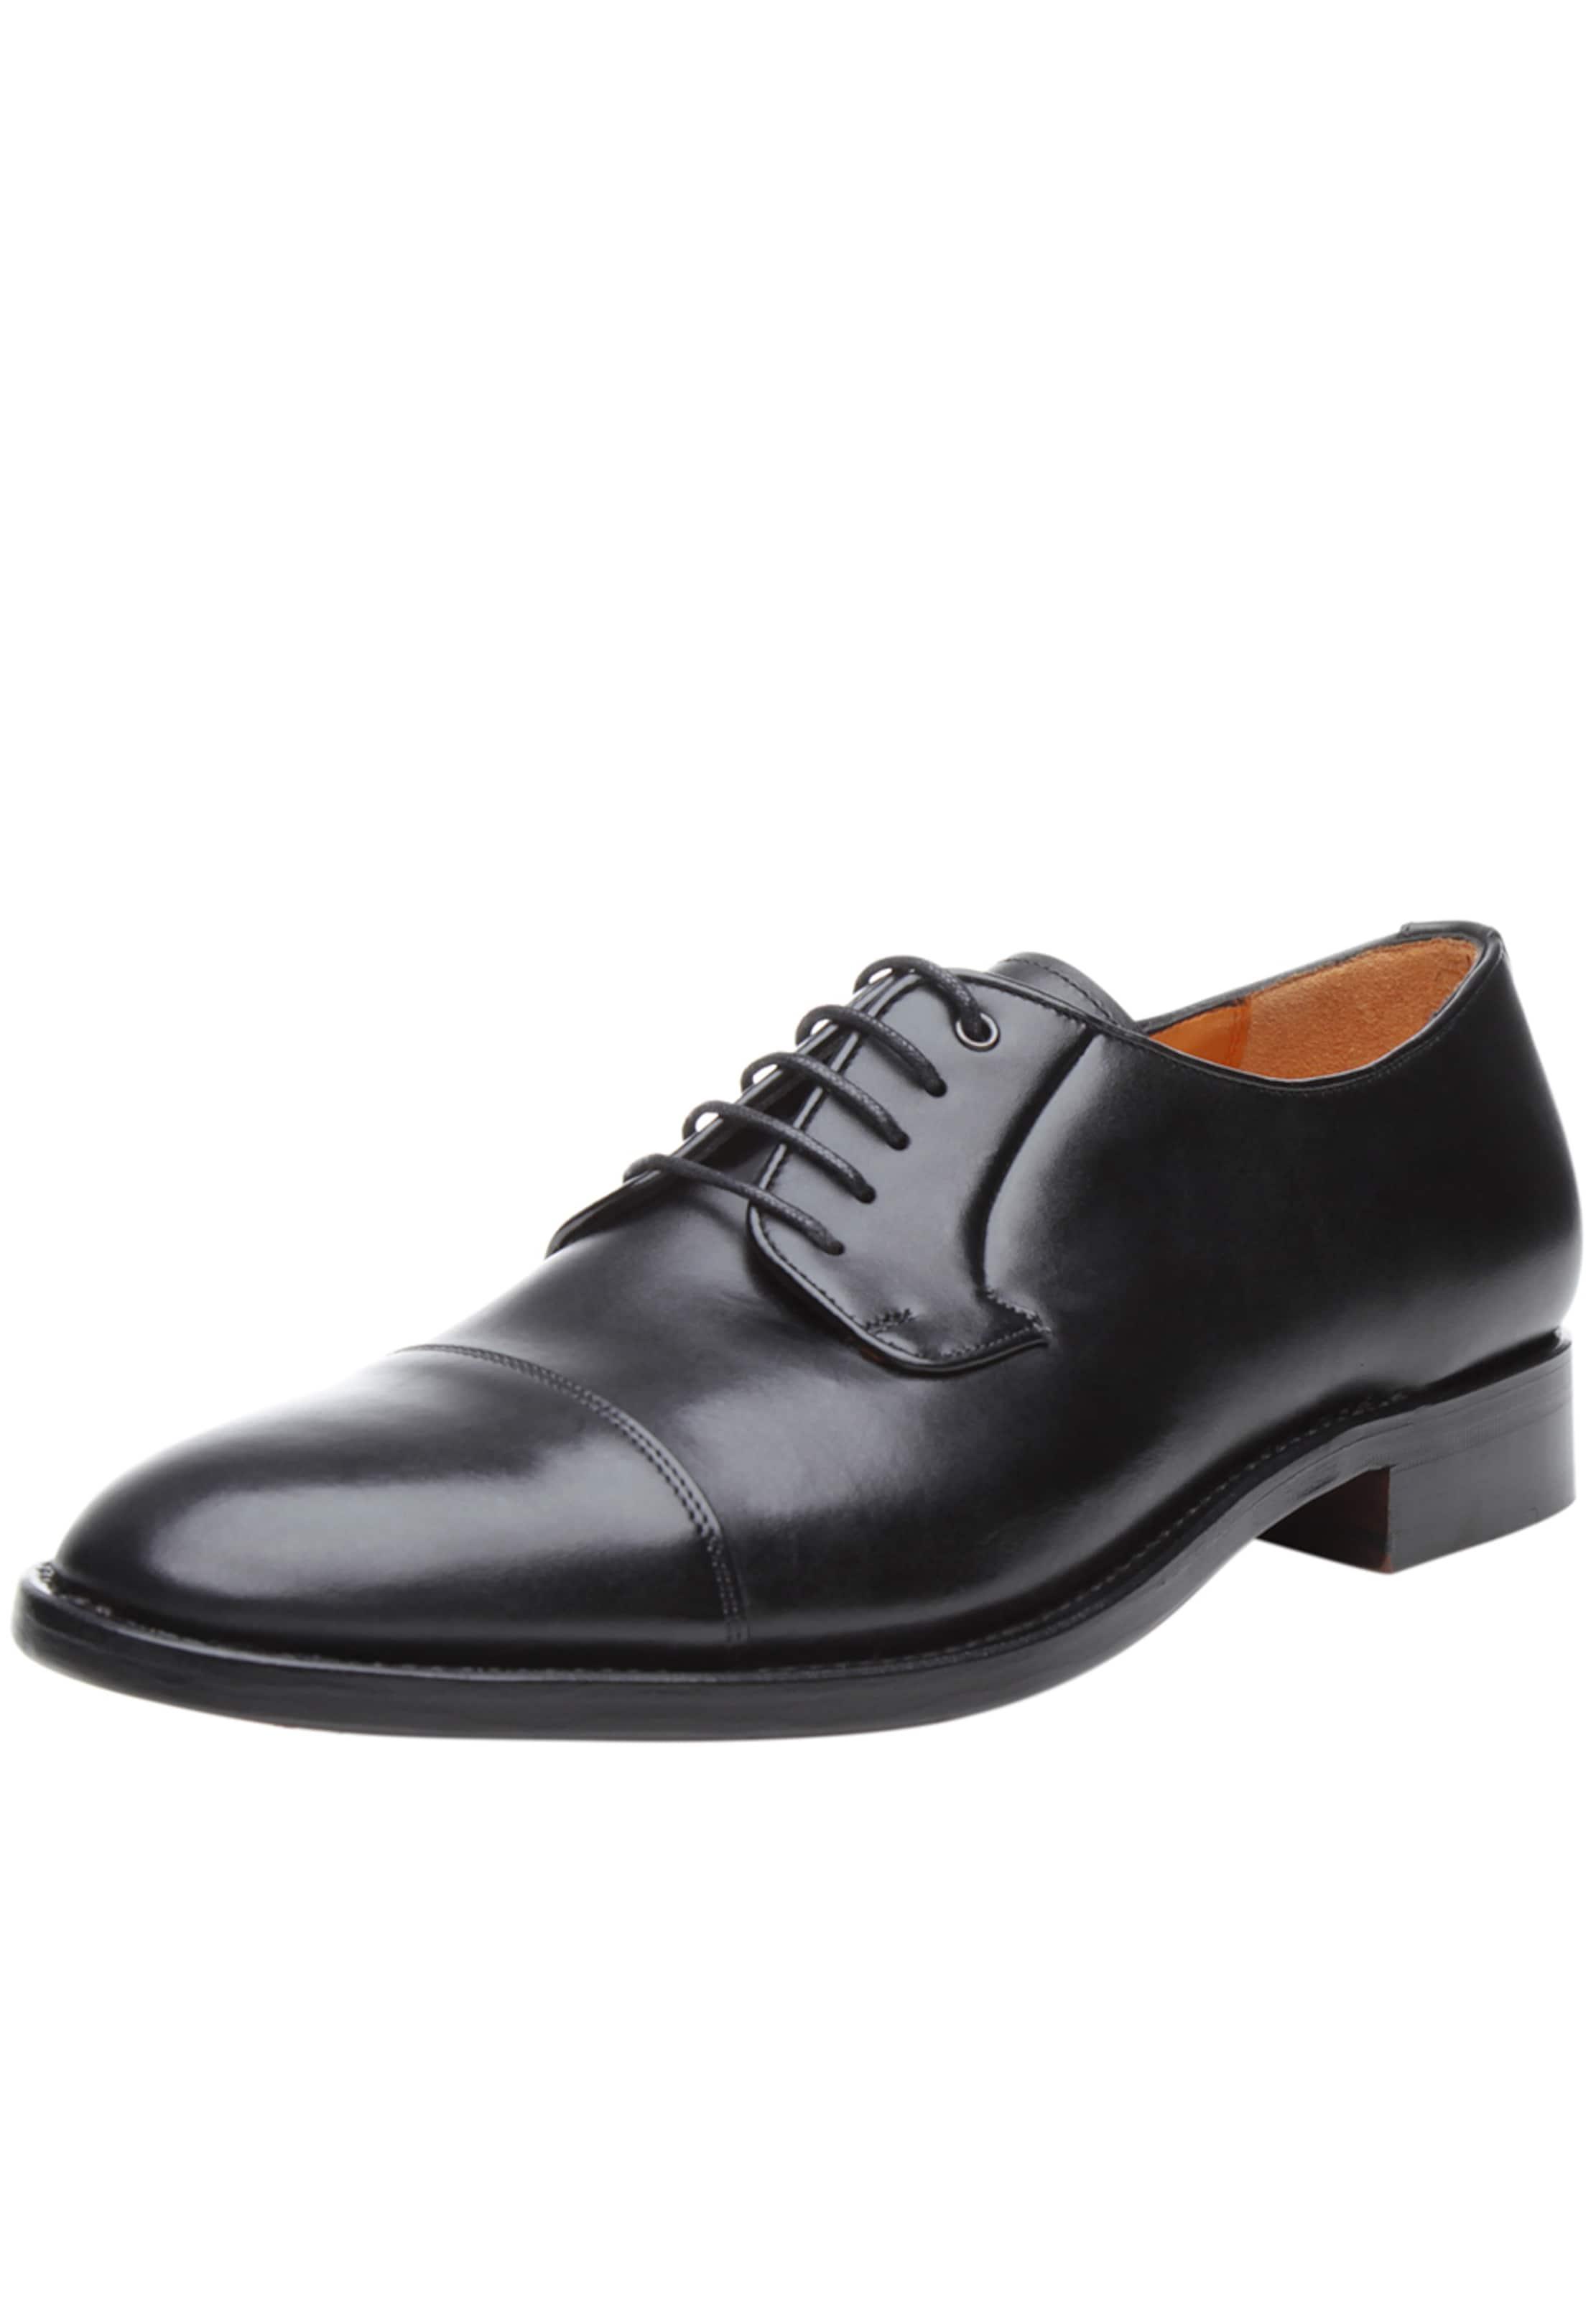 Shoepassion Halbschuhe Schwarz Shoepassion Halbschuhe Halbschuhe In 'no5400' In Shoepassion 'no5400' Schwarz 0vmO8nwN